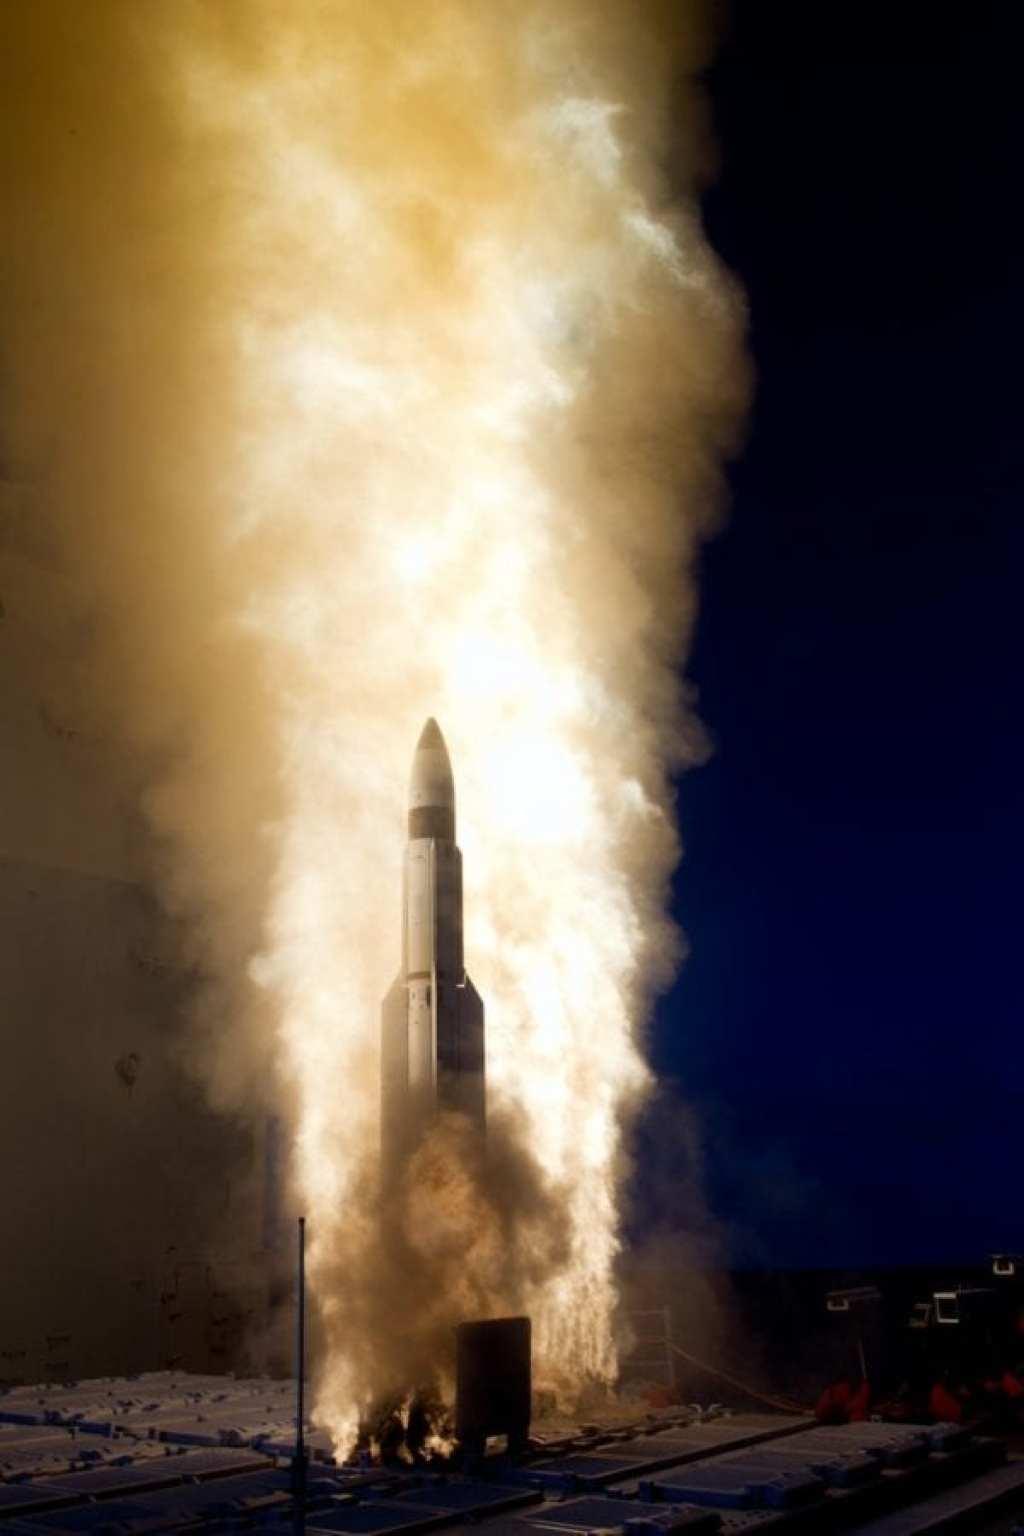 tandard Missile – 3 (SM-3) Block 1B